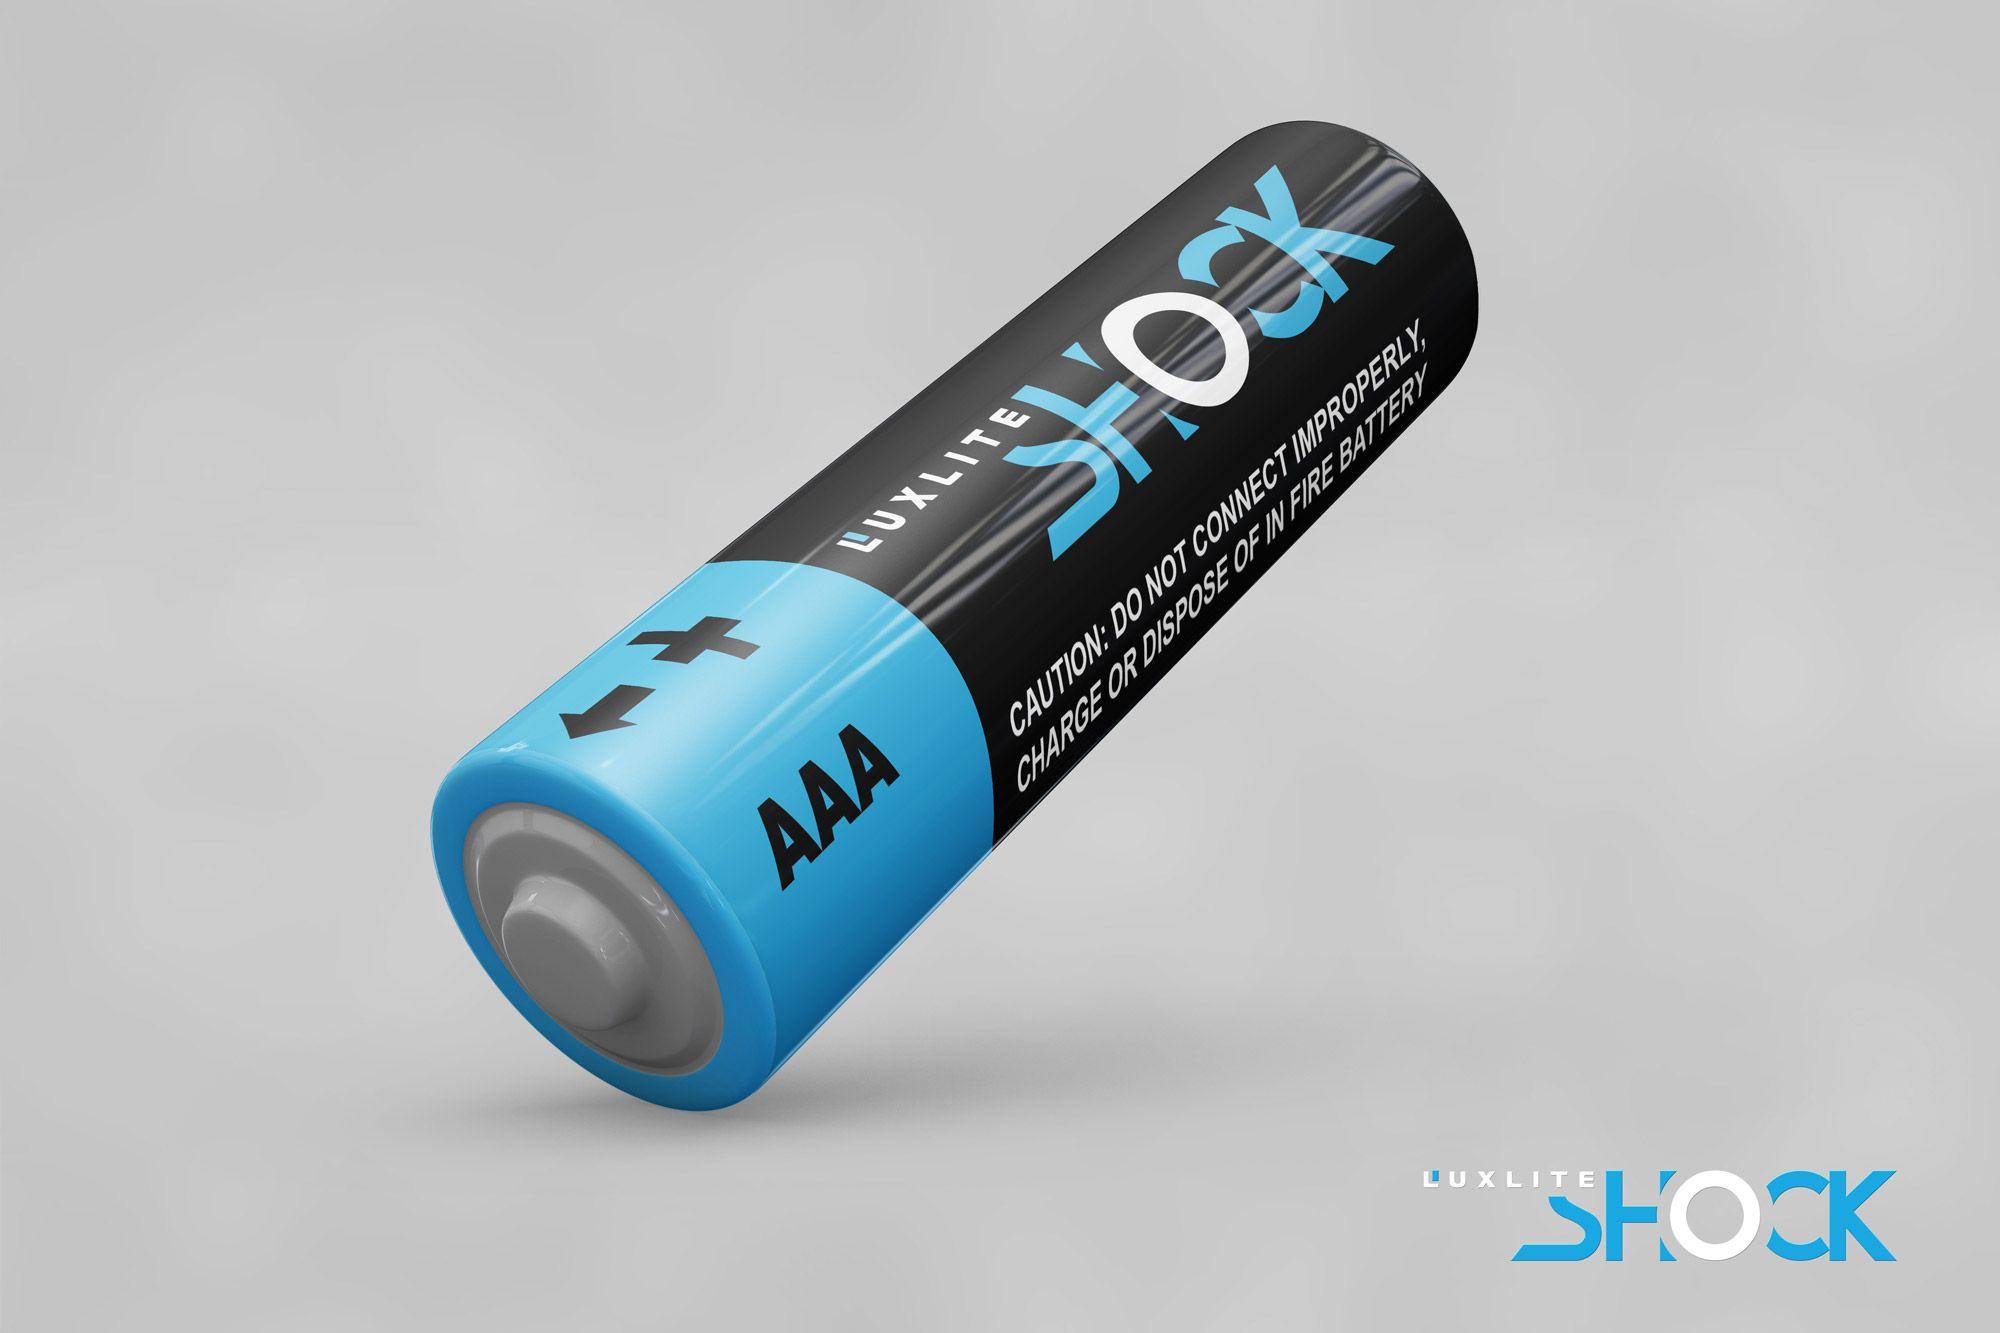 Логотип для батареек LUXLITE SHOCK - дизайнер Alphir